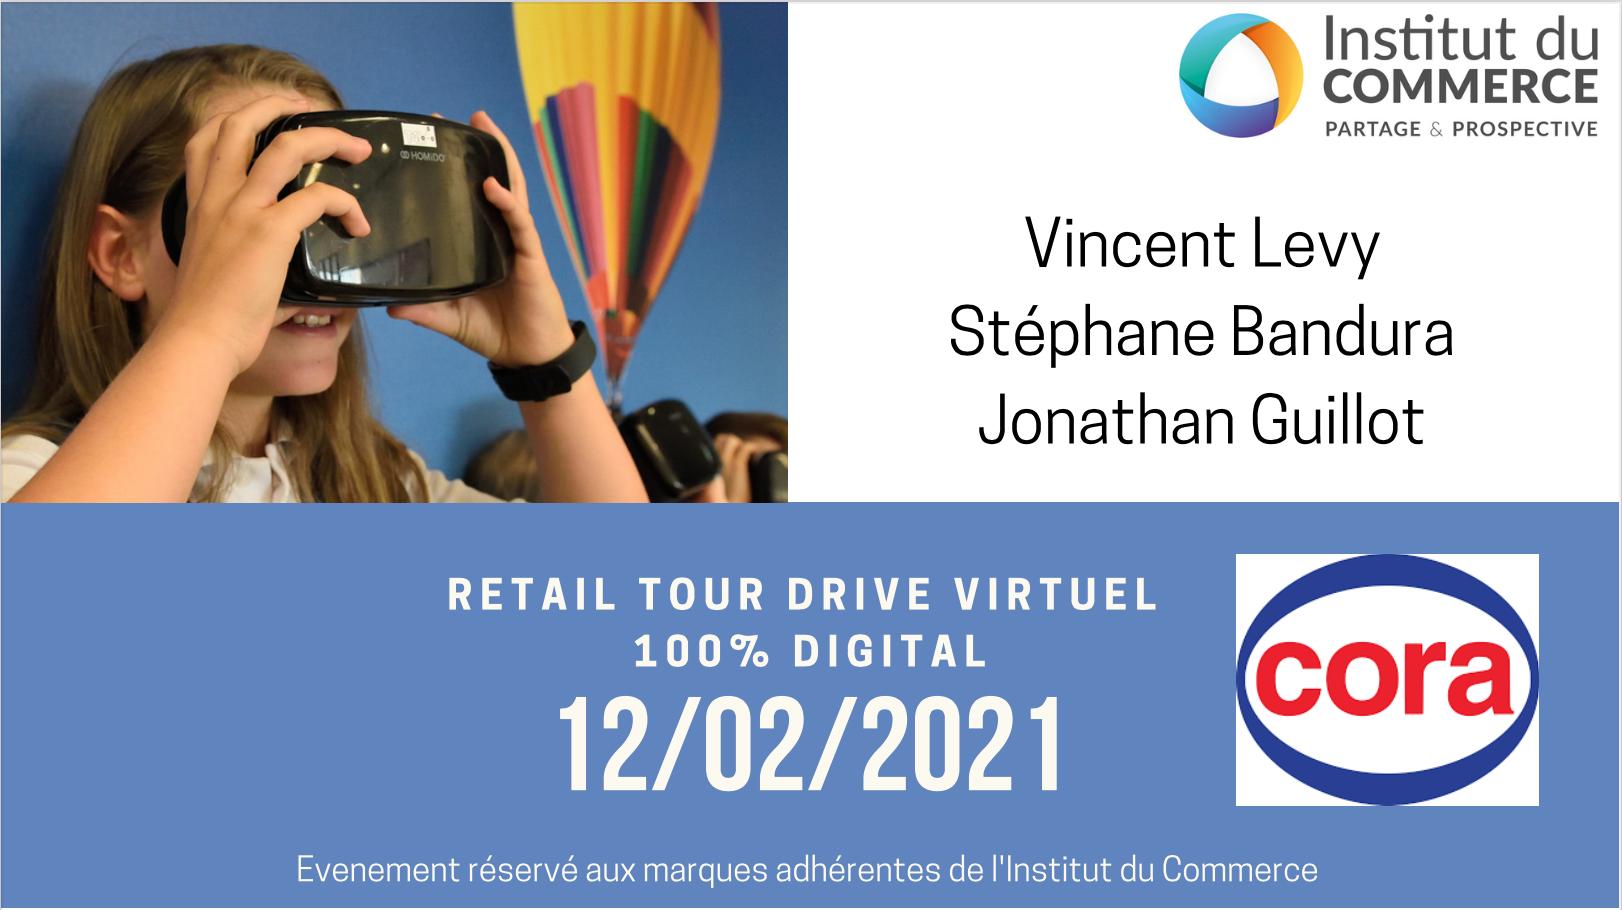 Retail Tour Virtuel E-commerce Cora